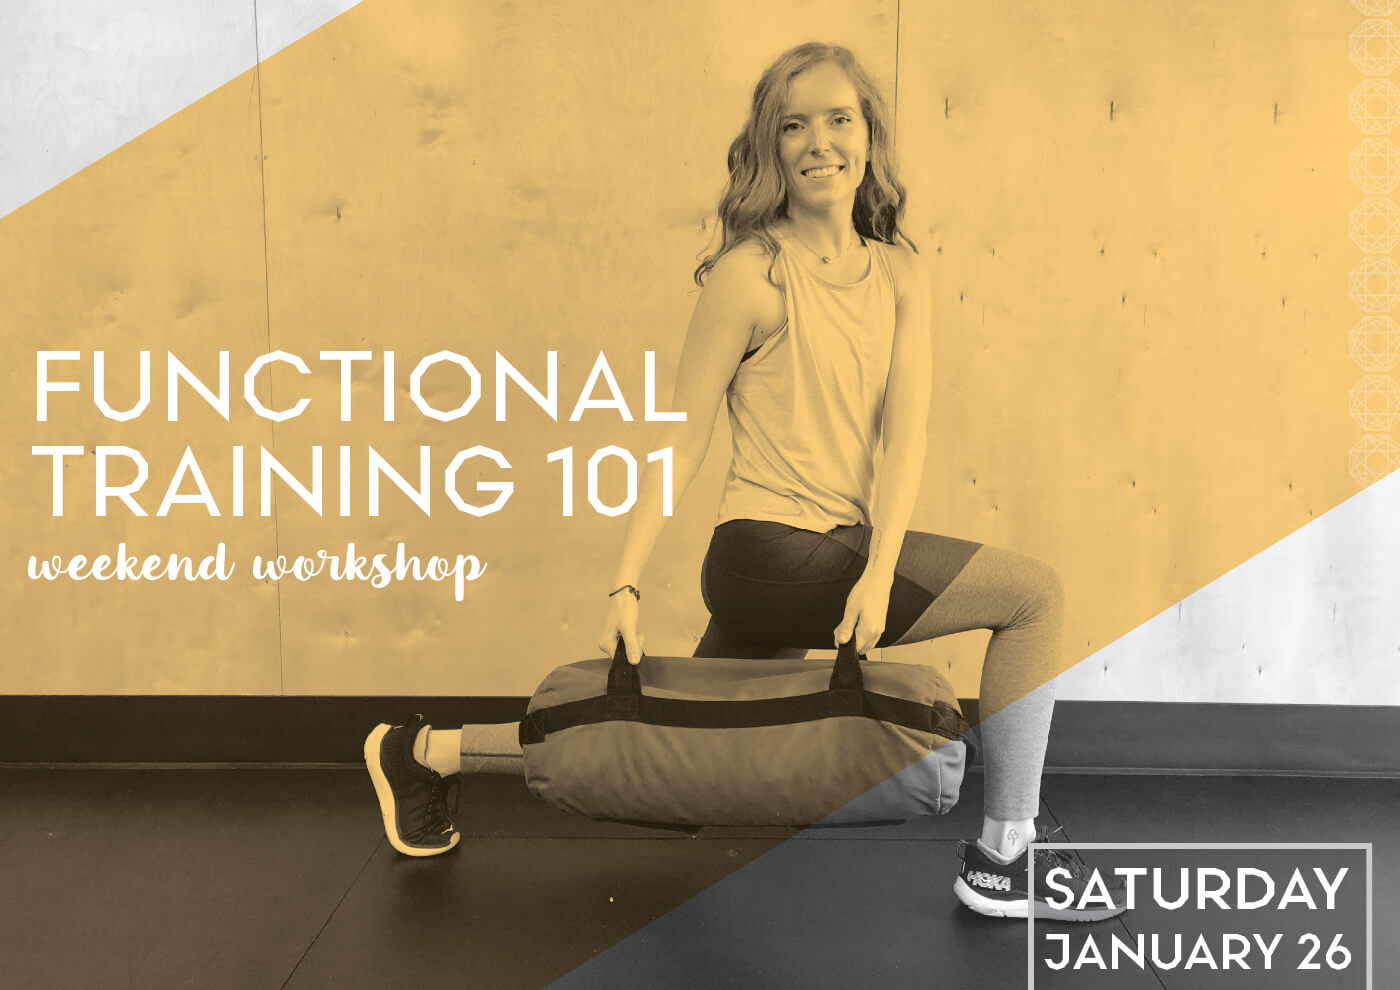 Functional Training 101